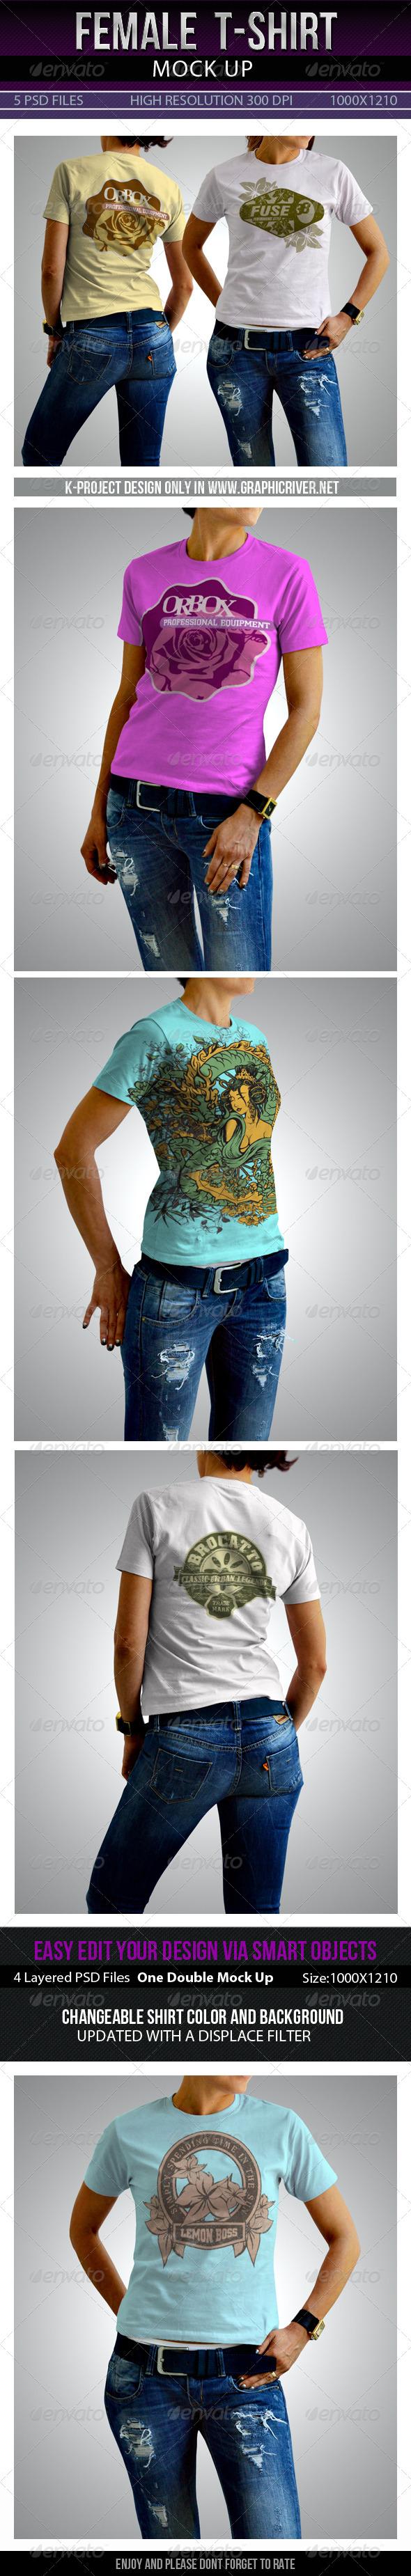 Female T-Shirt Mock Up